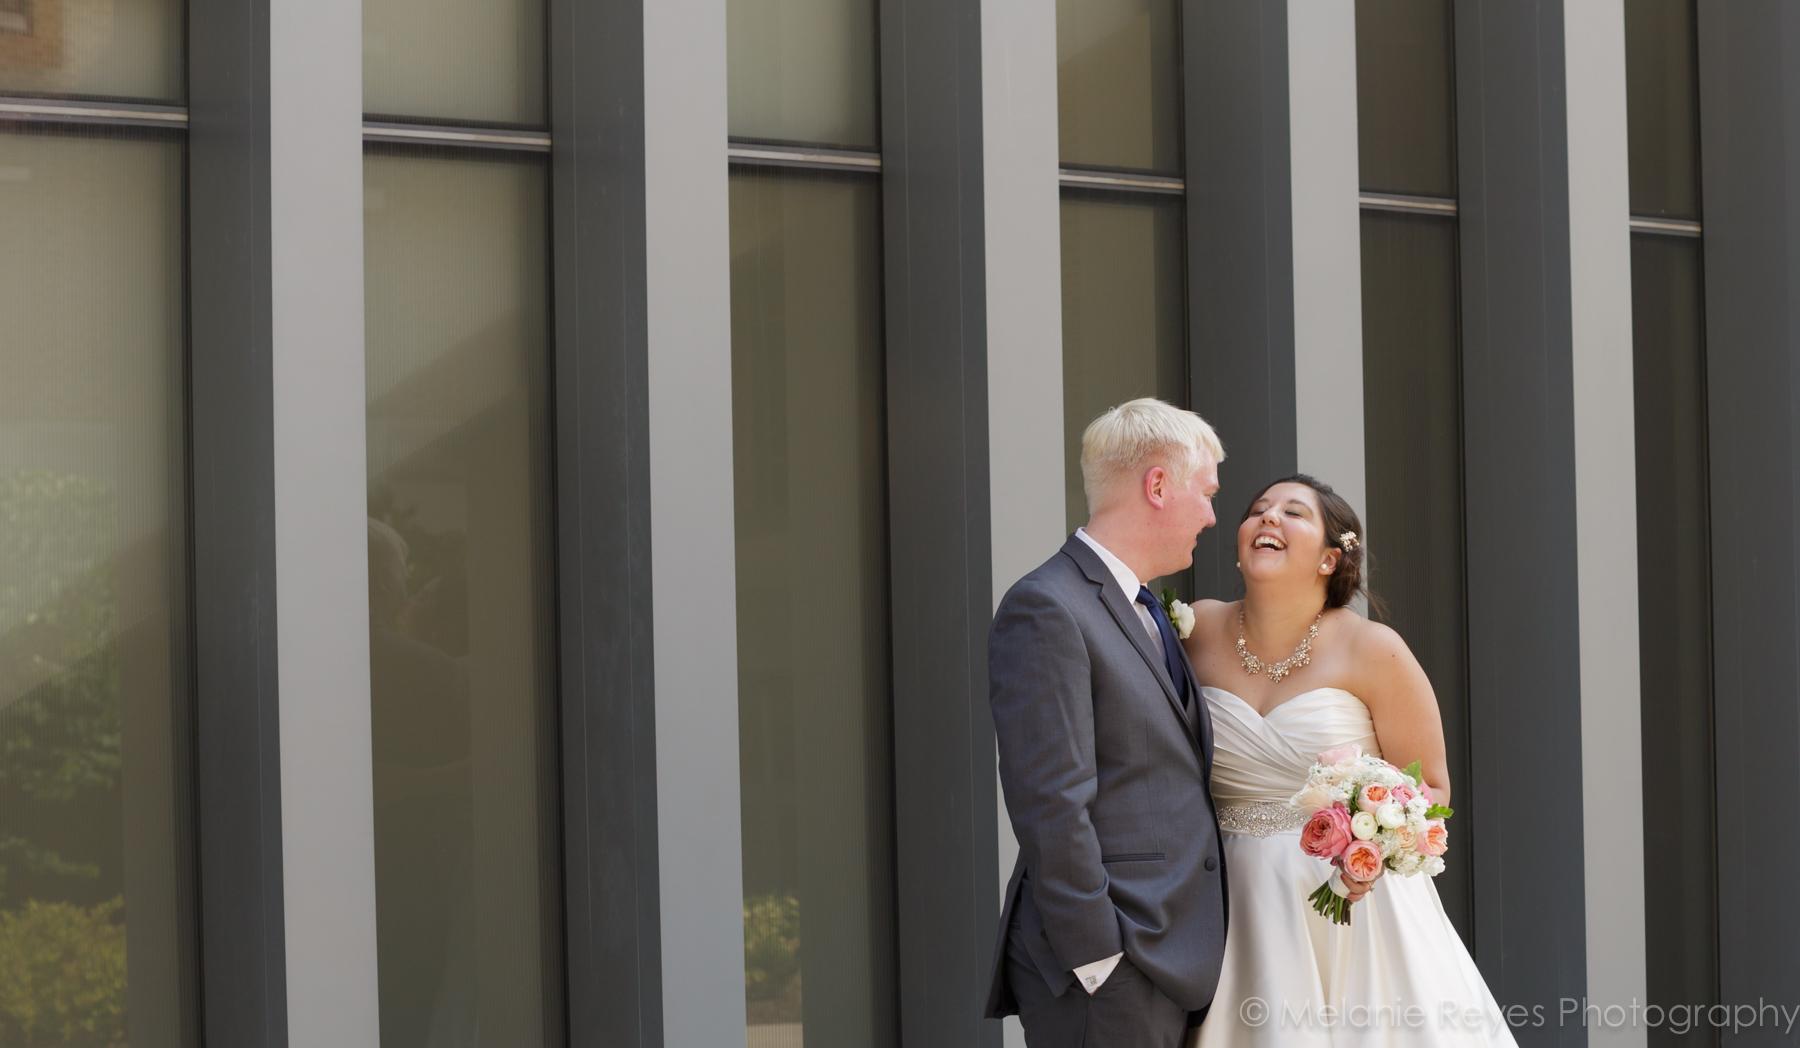 MC_annarbor_uofm_wedding_031